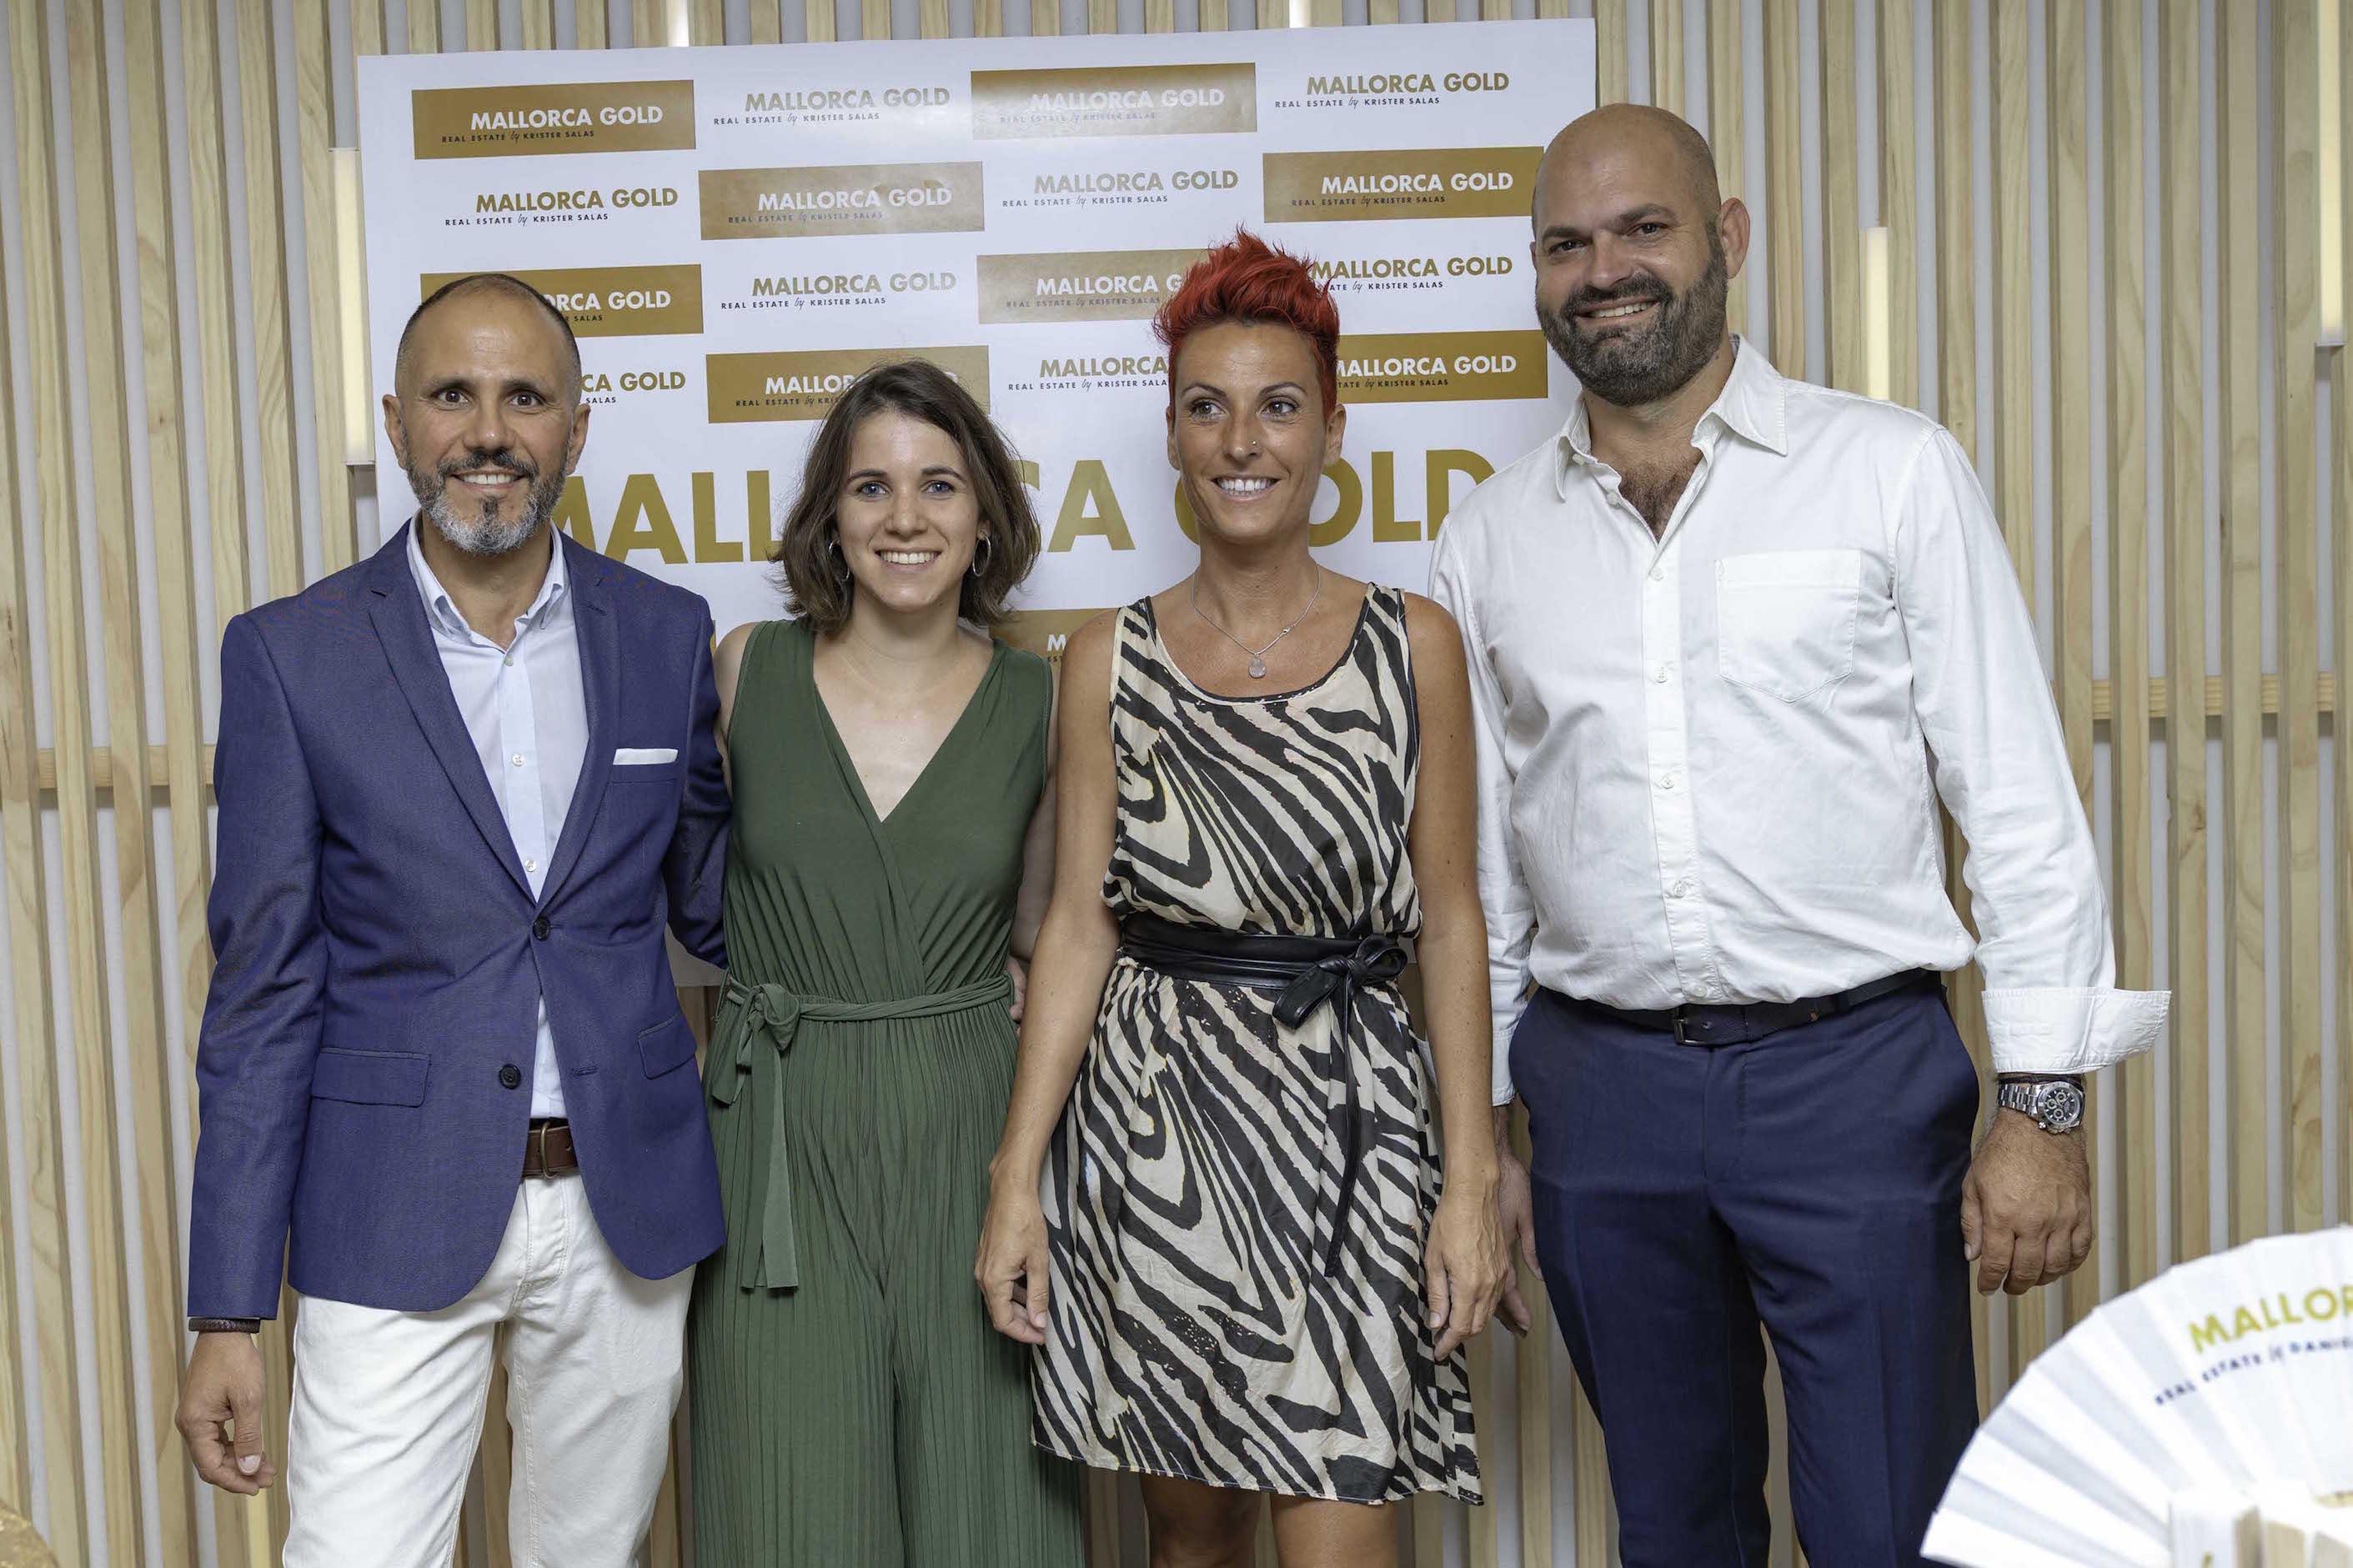 Das Mallorca Gold Team von links nach rechts: José Martin, Irene Ramos, Deborah Rossi, Krister Salas